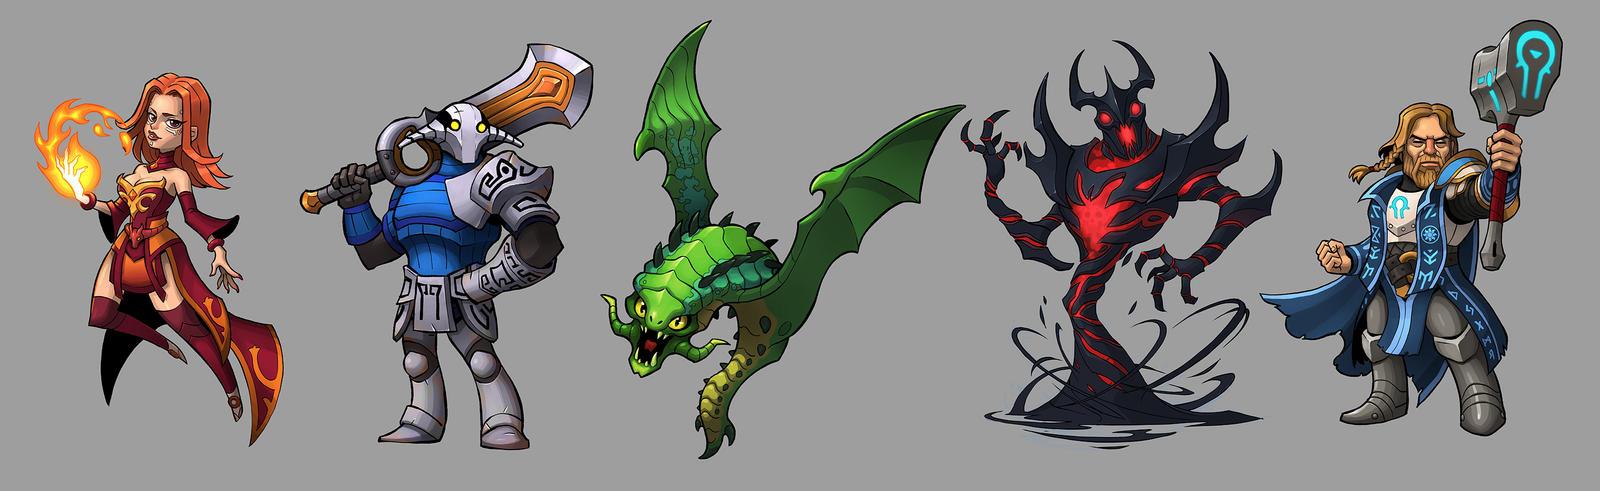 commission dota 2 heroes by novanim on deviantart